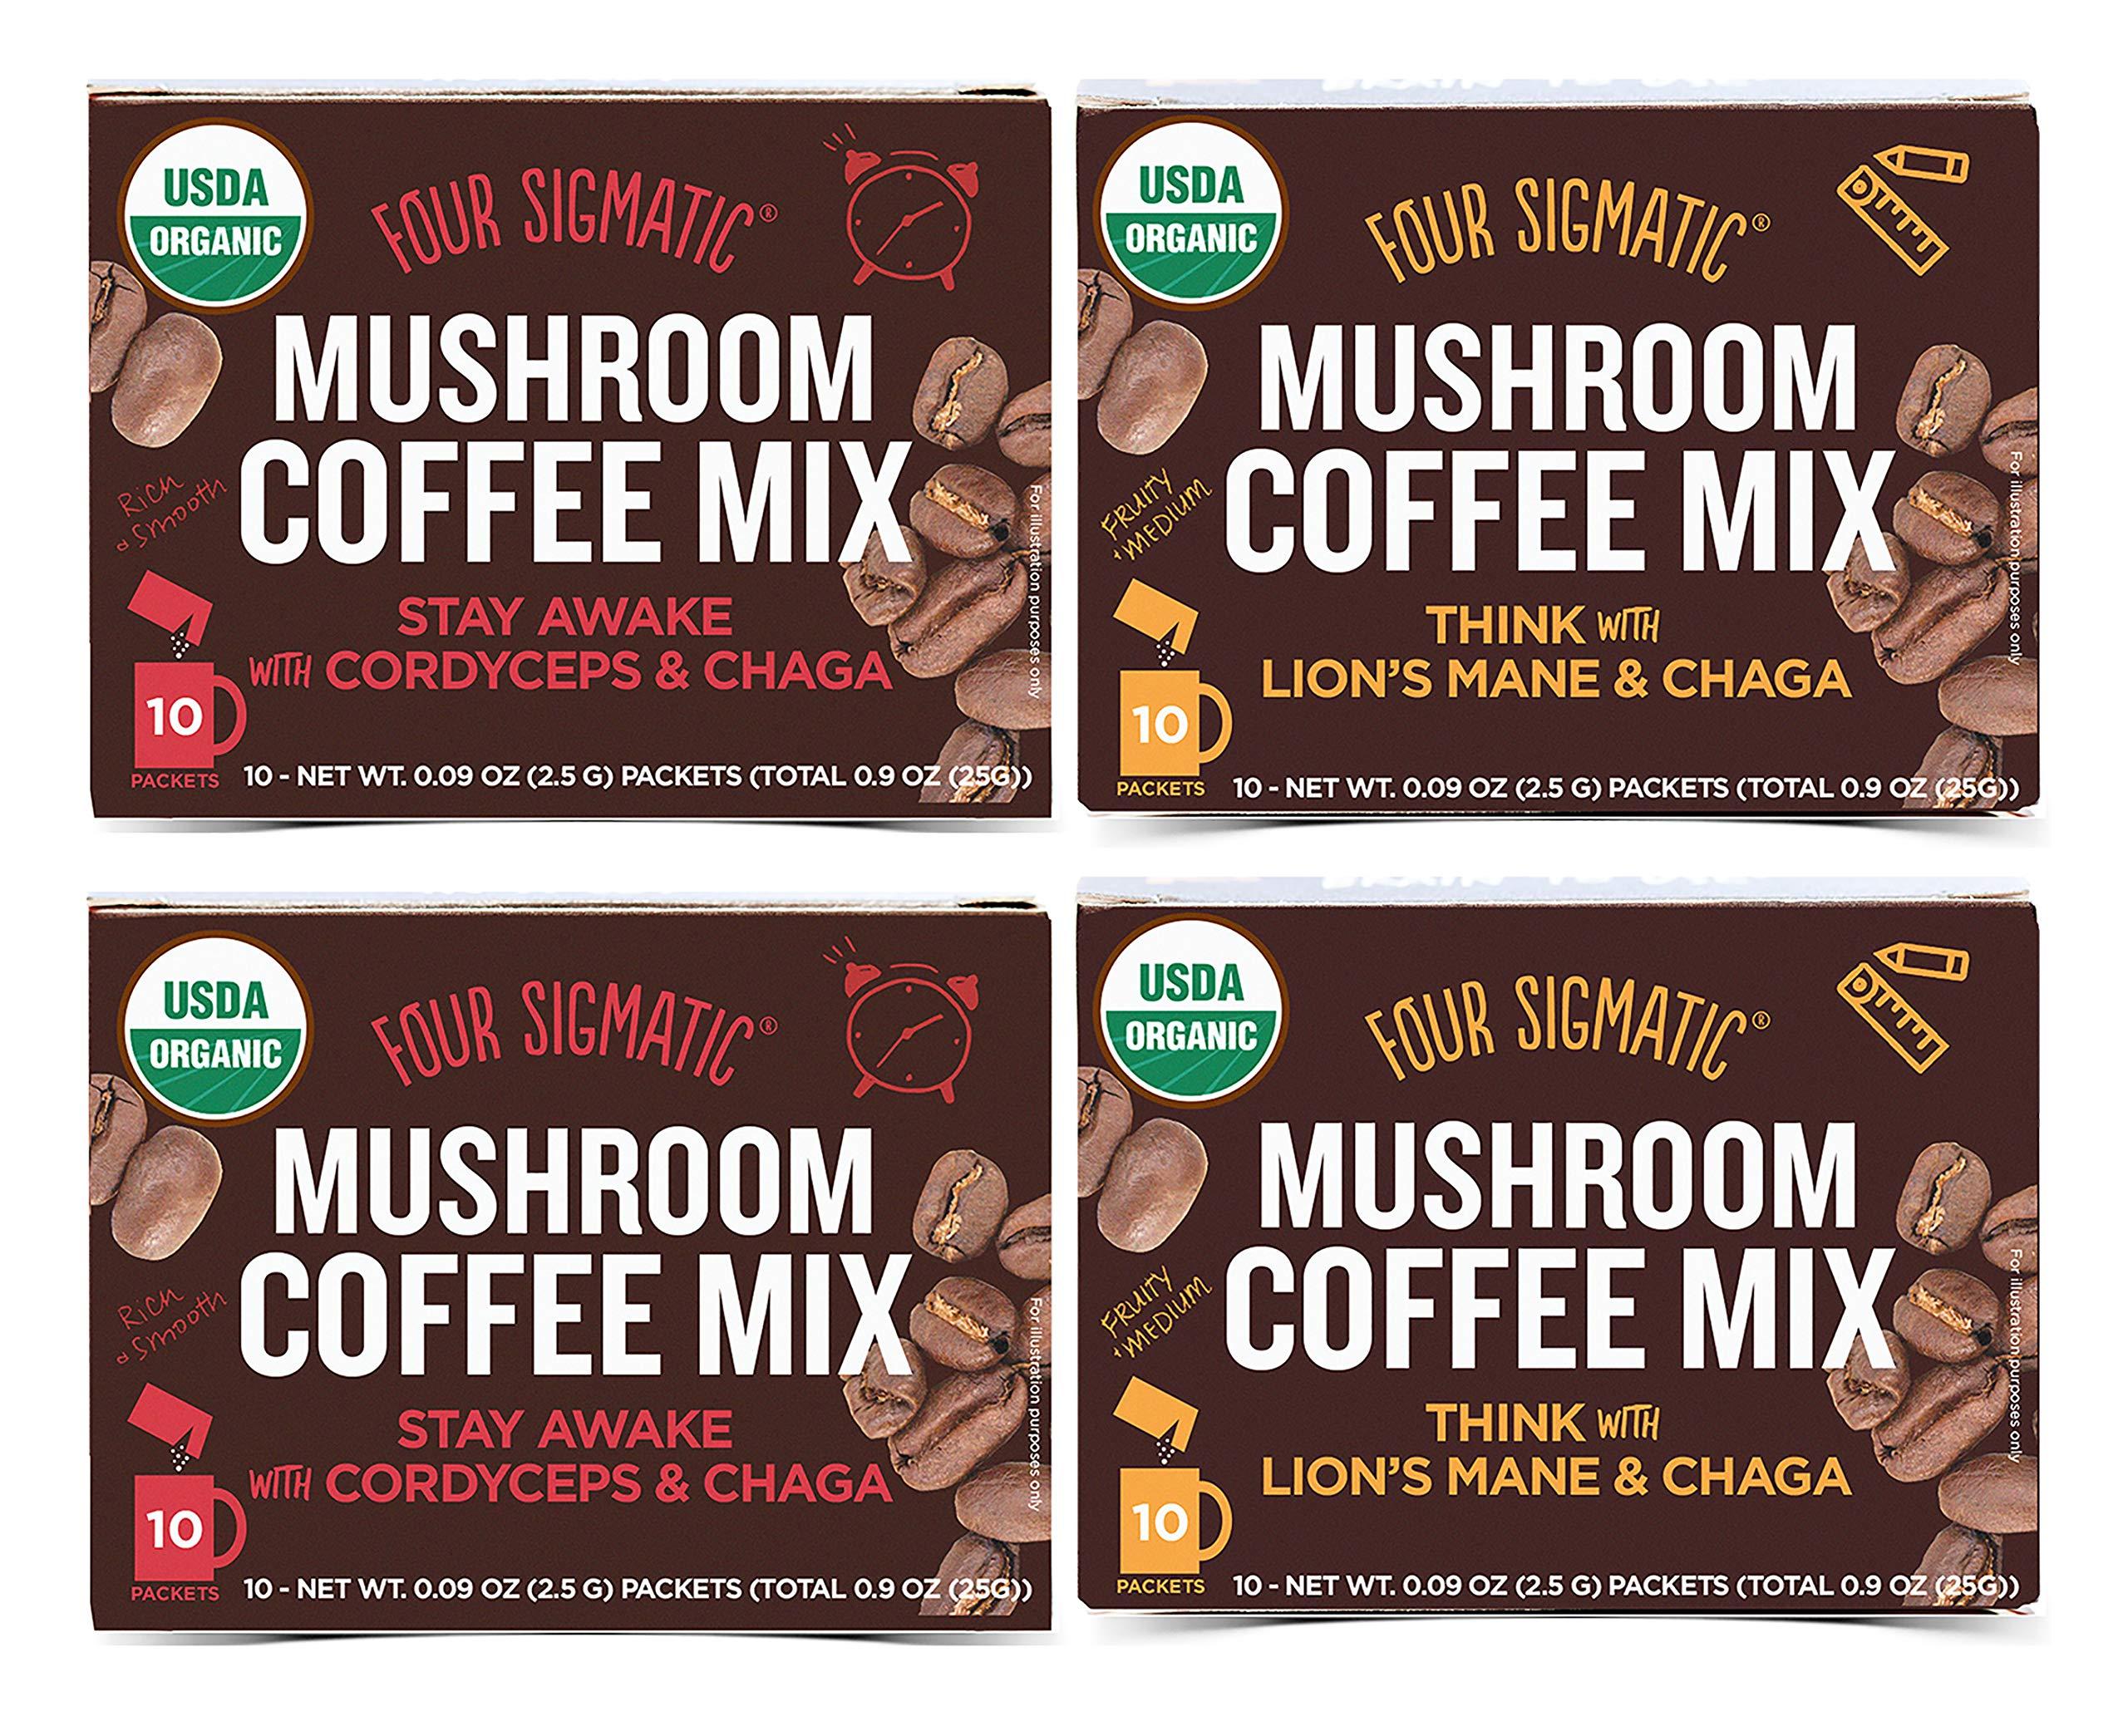 Four Sigmatic Mushroom Coffee Mix Pack of 4 - Lion's Mane and Chaga & Cordyceps and Chaga - 10 Packets Per Box